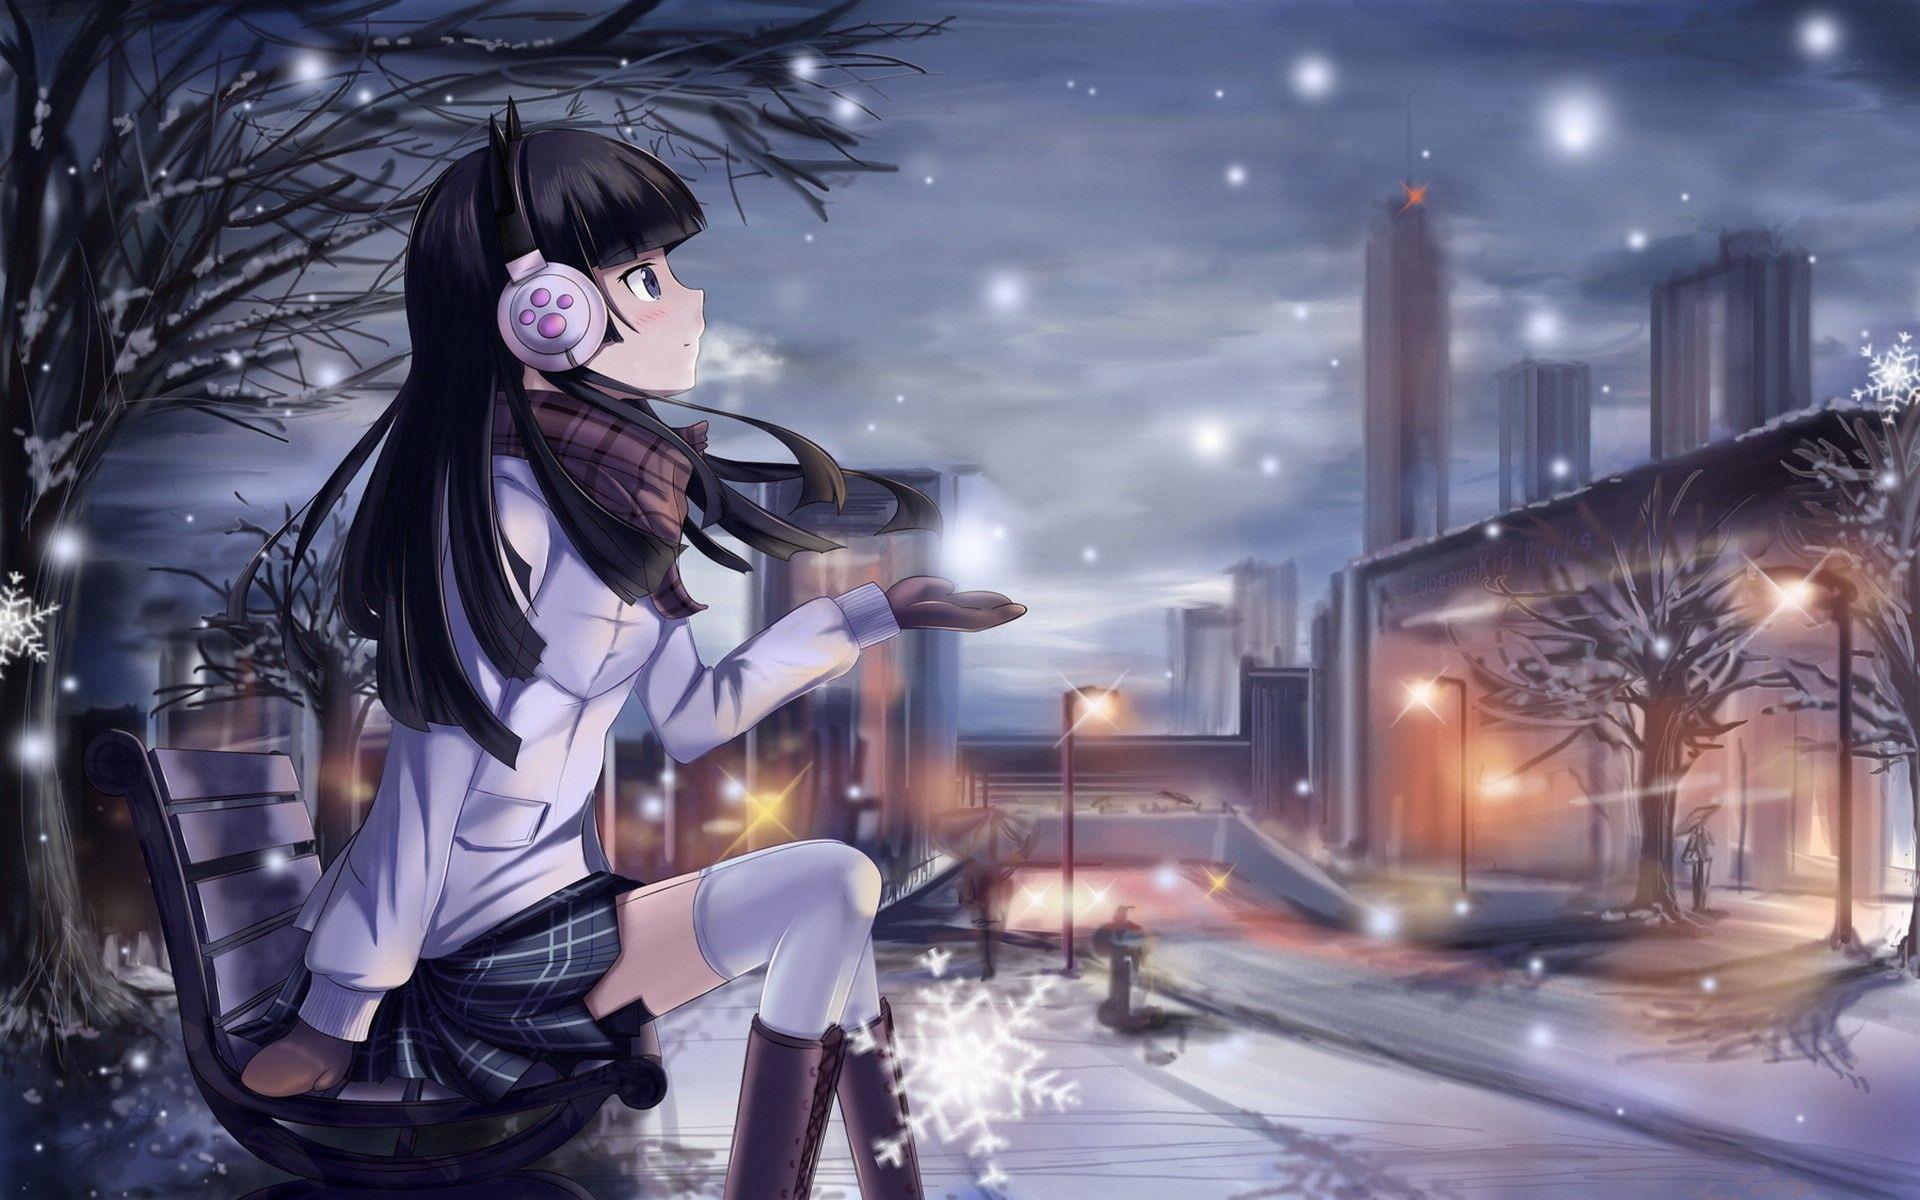 anime girl with headphones Google Search Anime